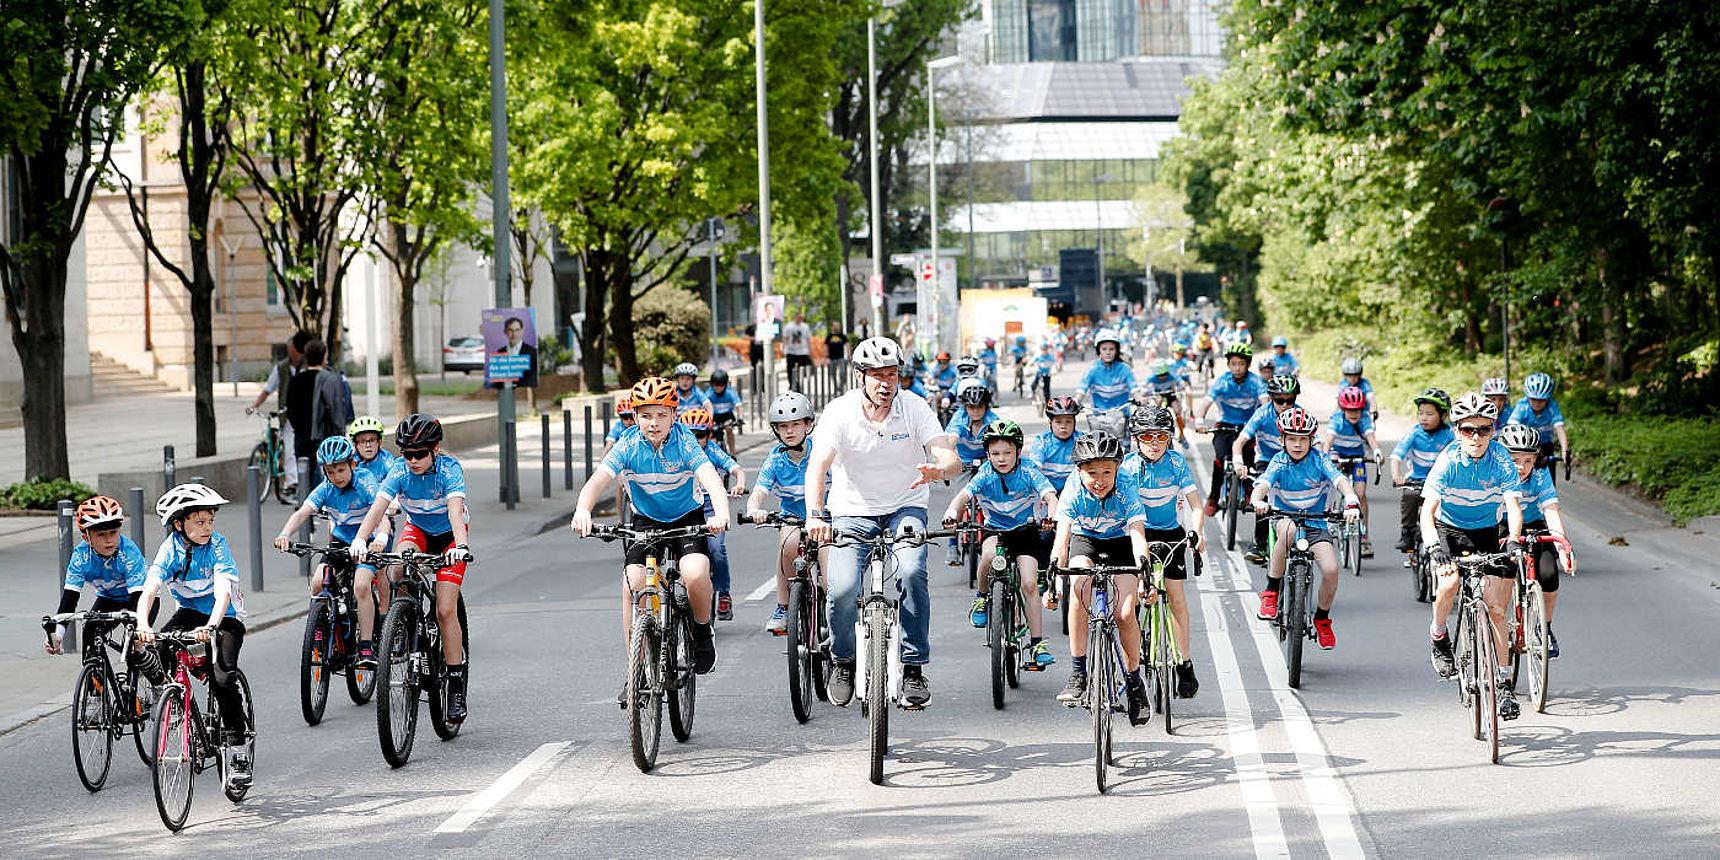 kinder+Sport mini tour Bike Parade bei Eschborn-Frankfurt